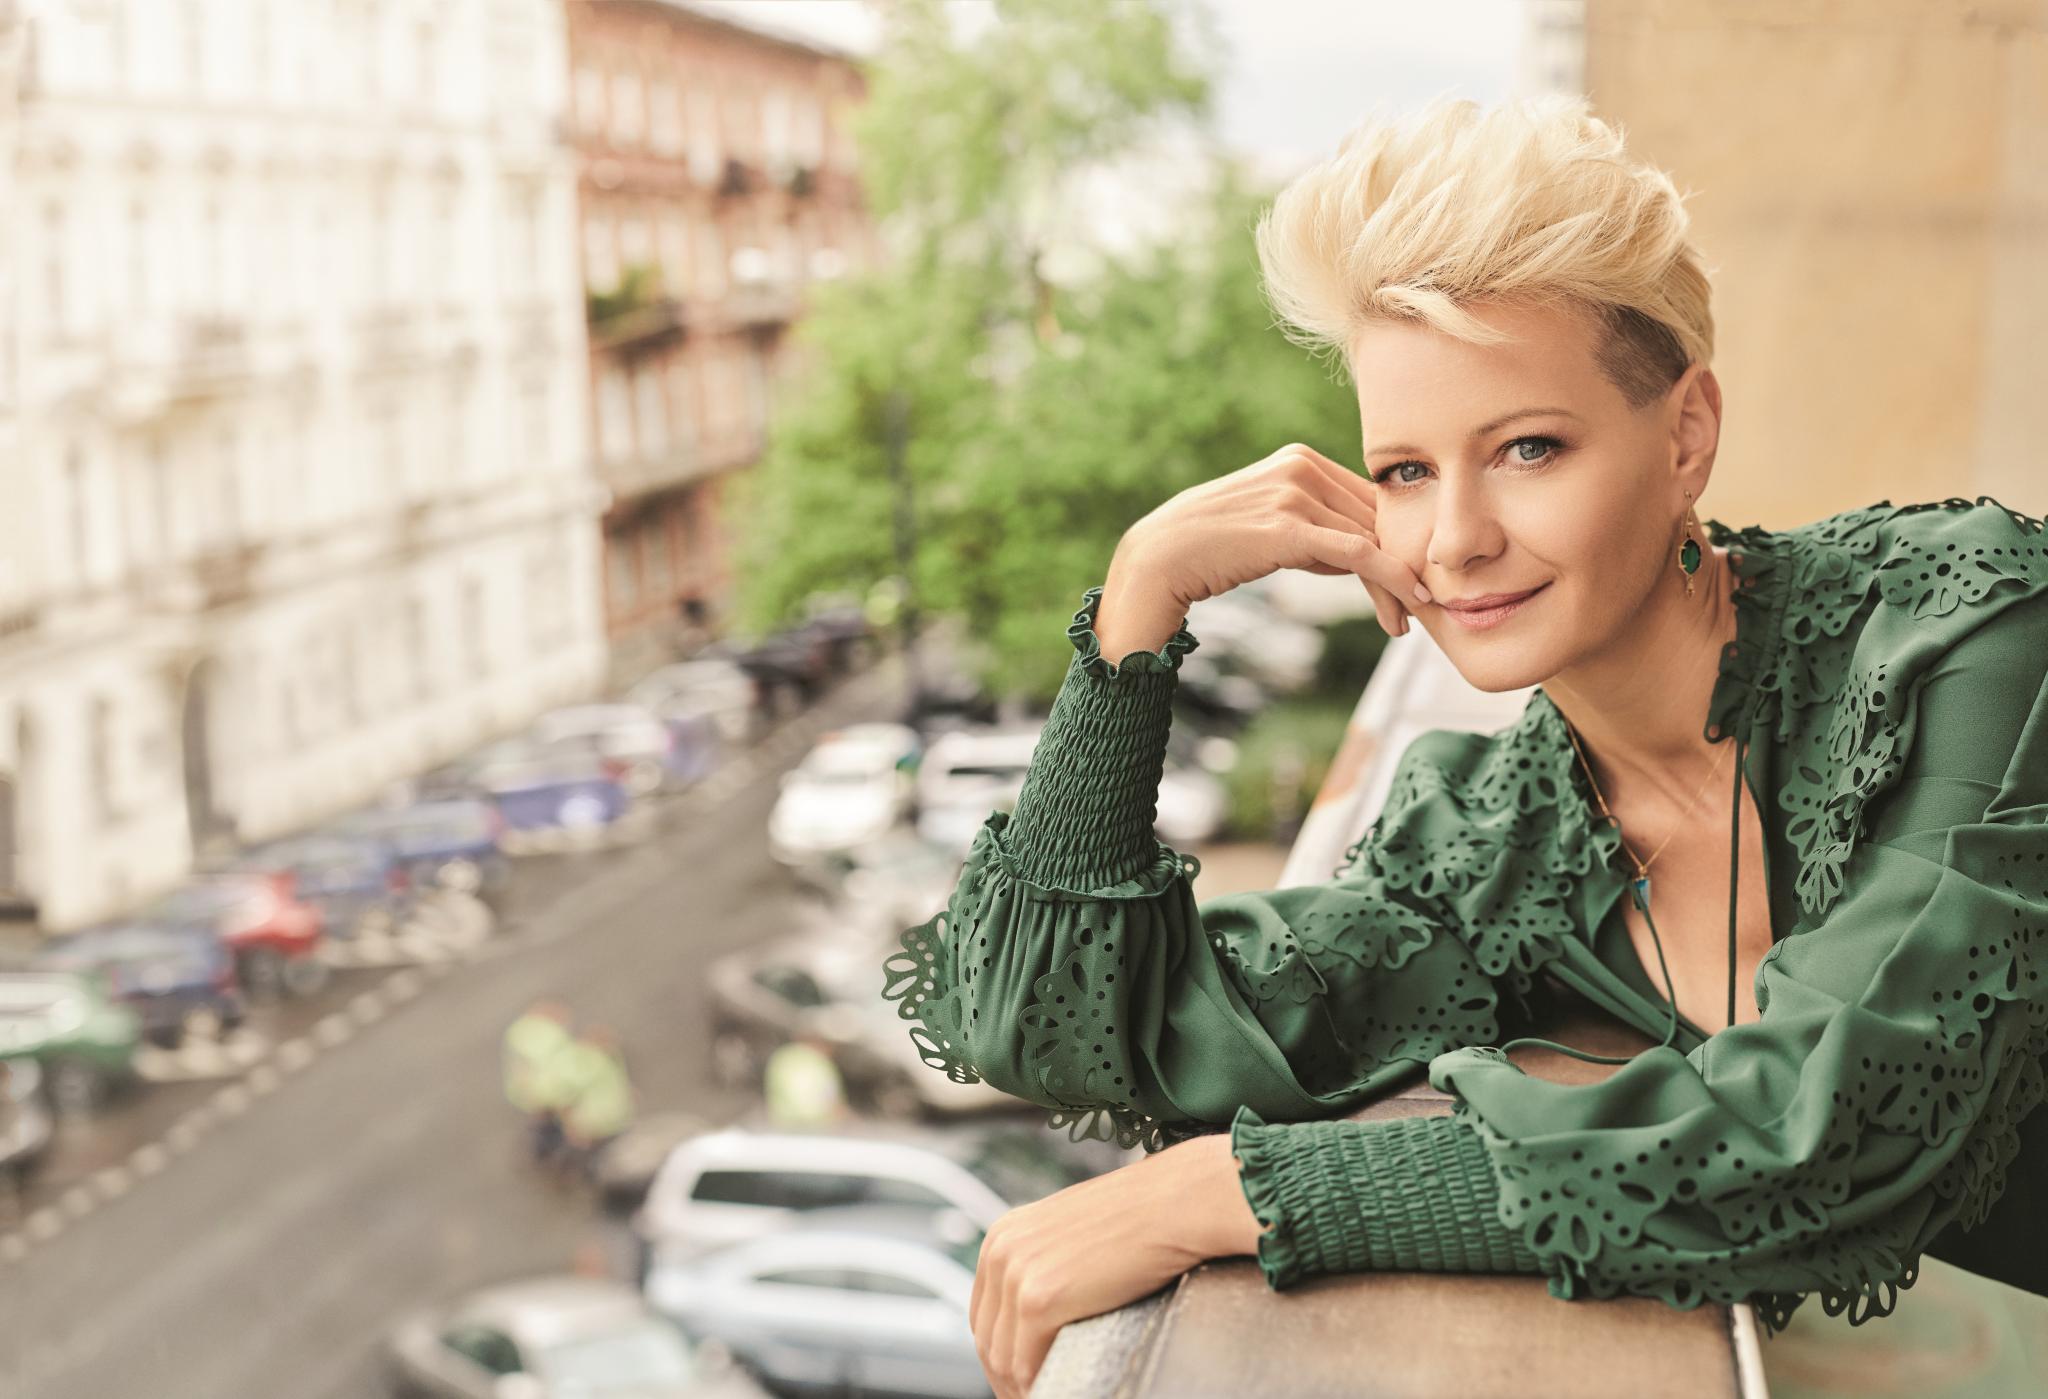 Małgorzata Kożuchowska: Inna ja